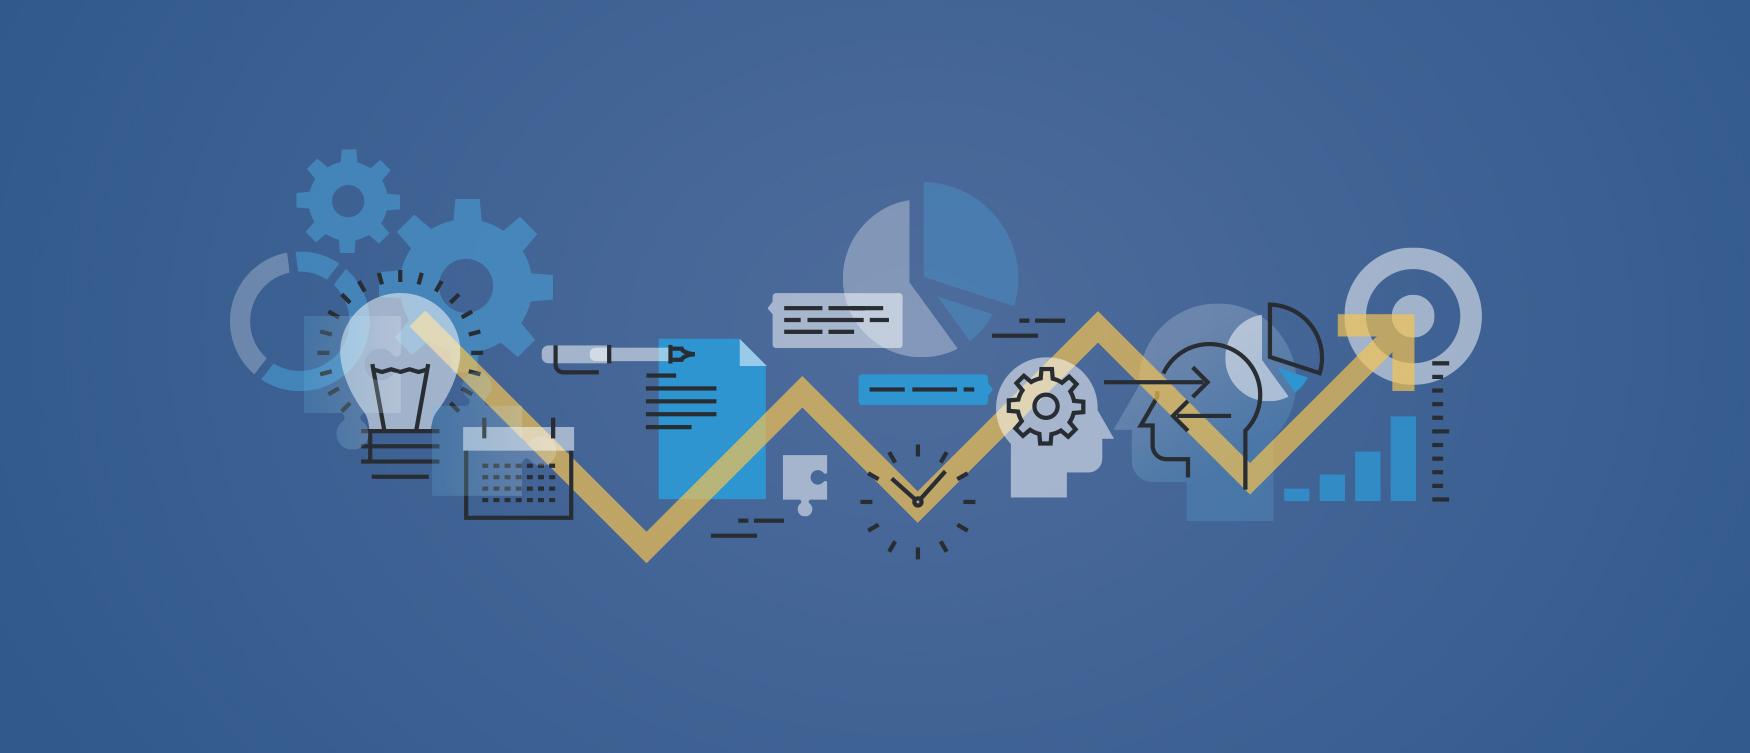 Top 5 Reasons Every Company Needs a Marketing Plan